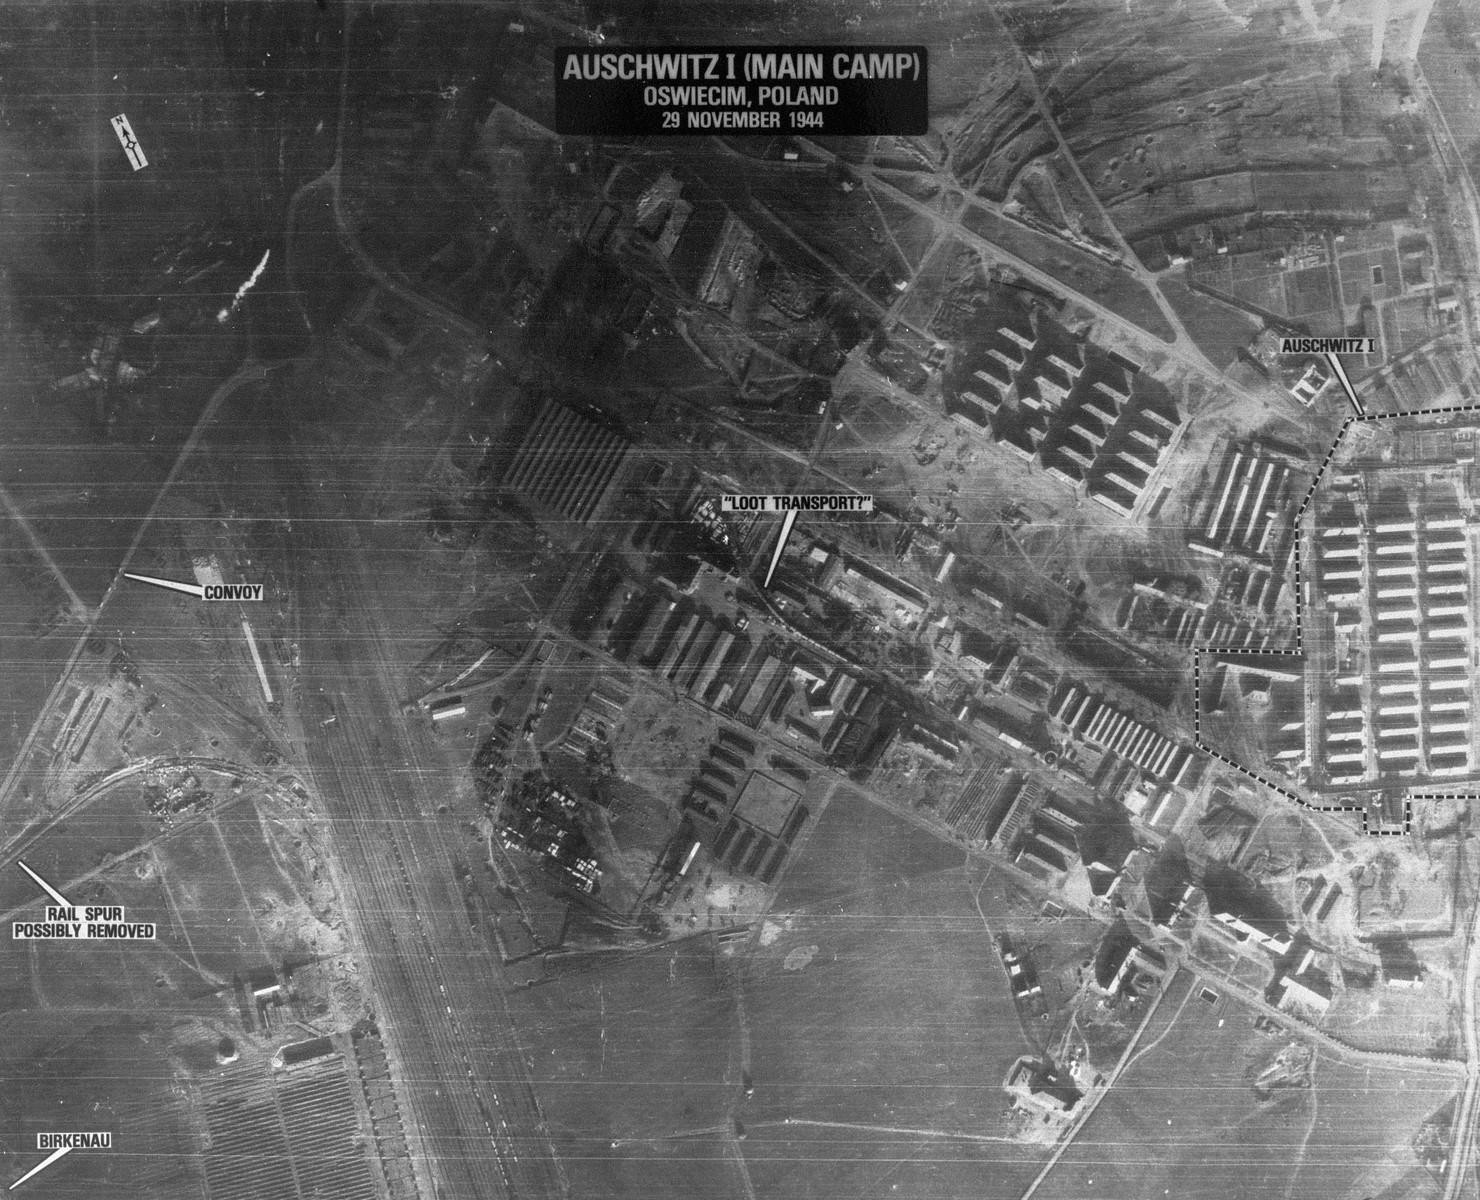 An aerial reconnaissance photograph showing Auschwitz I.